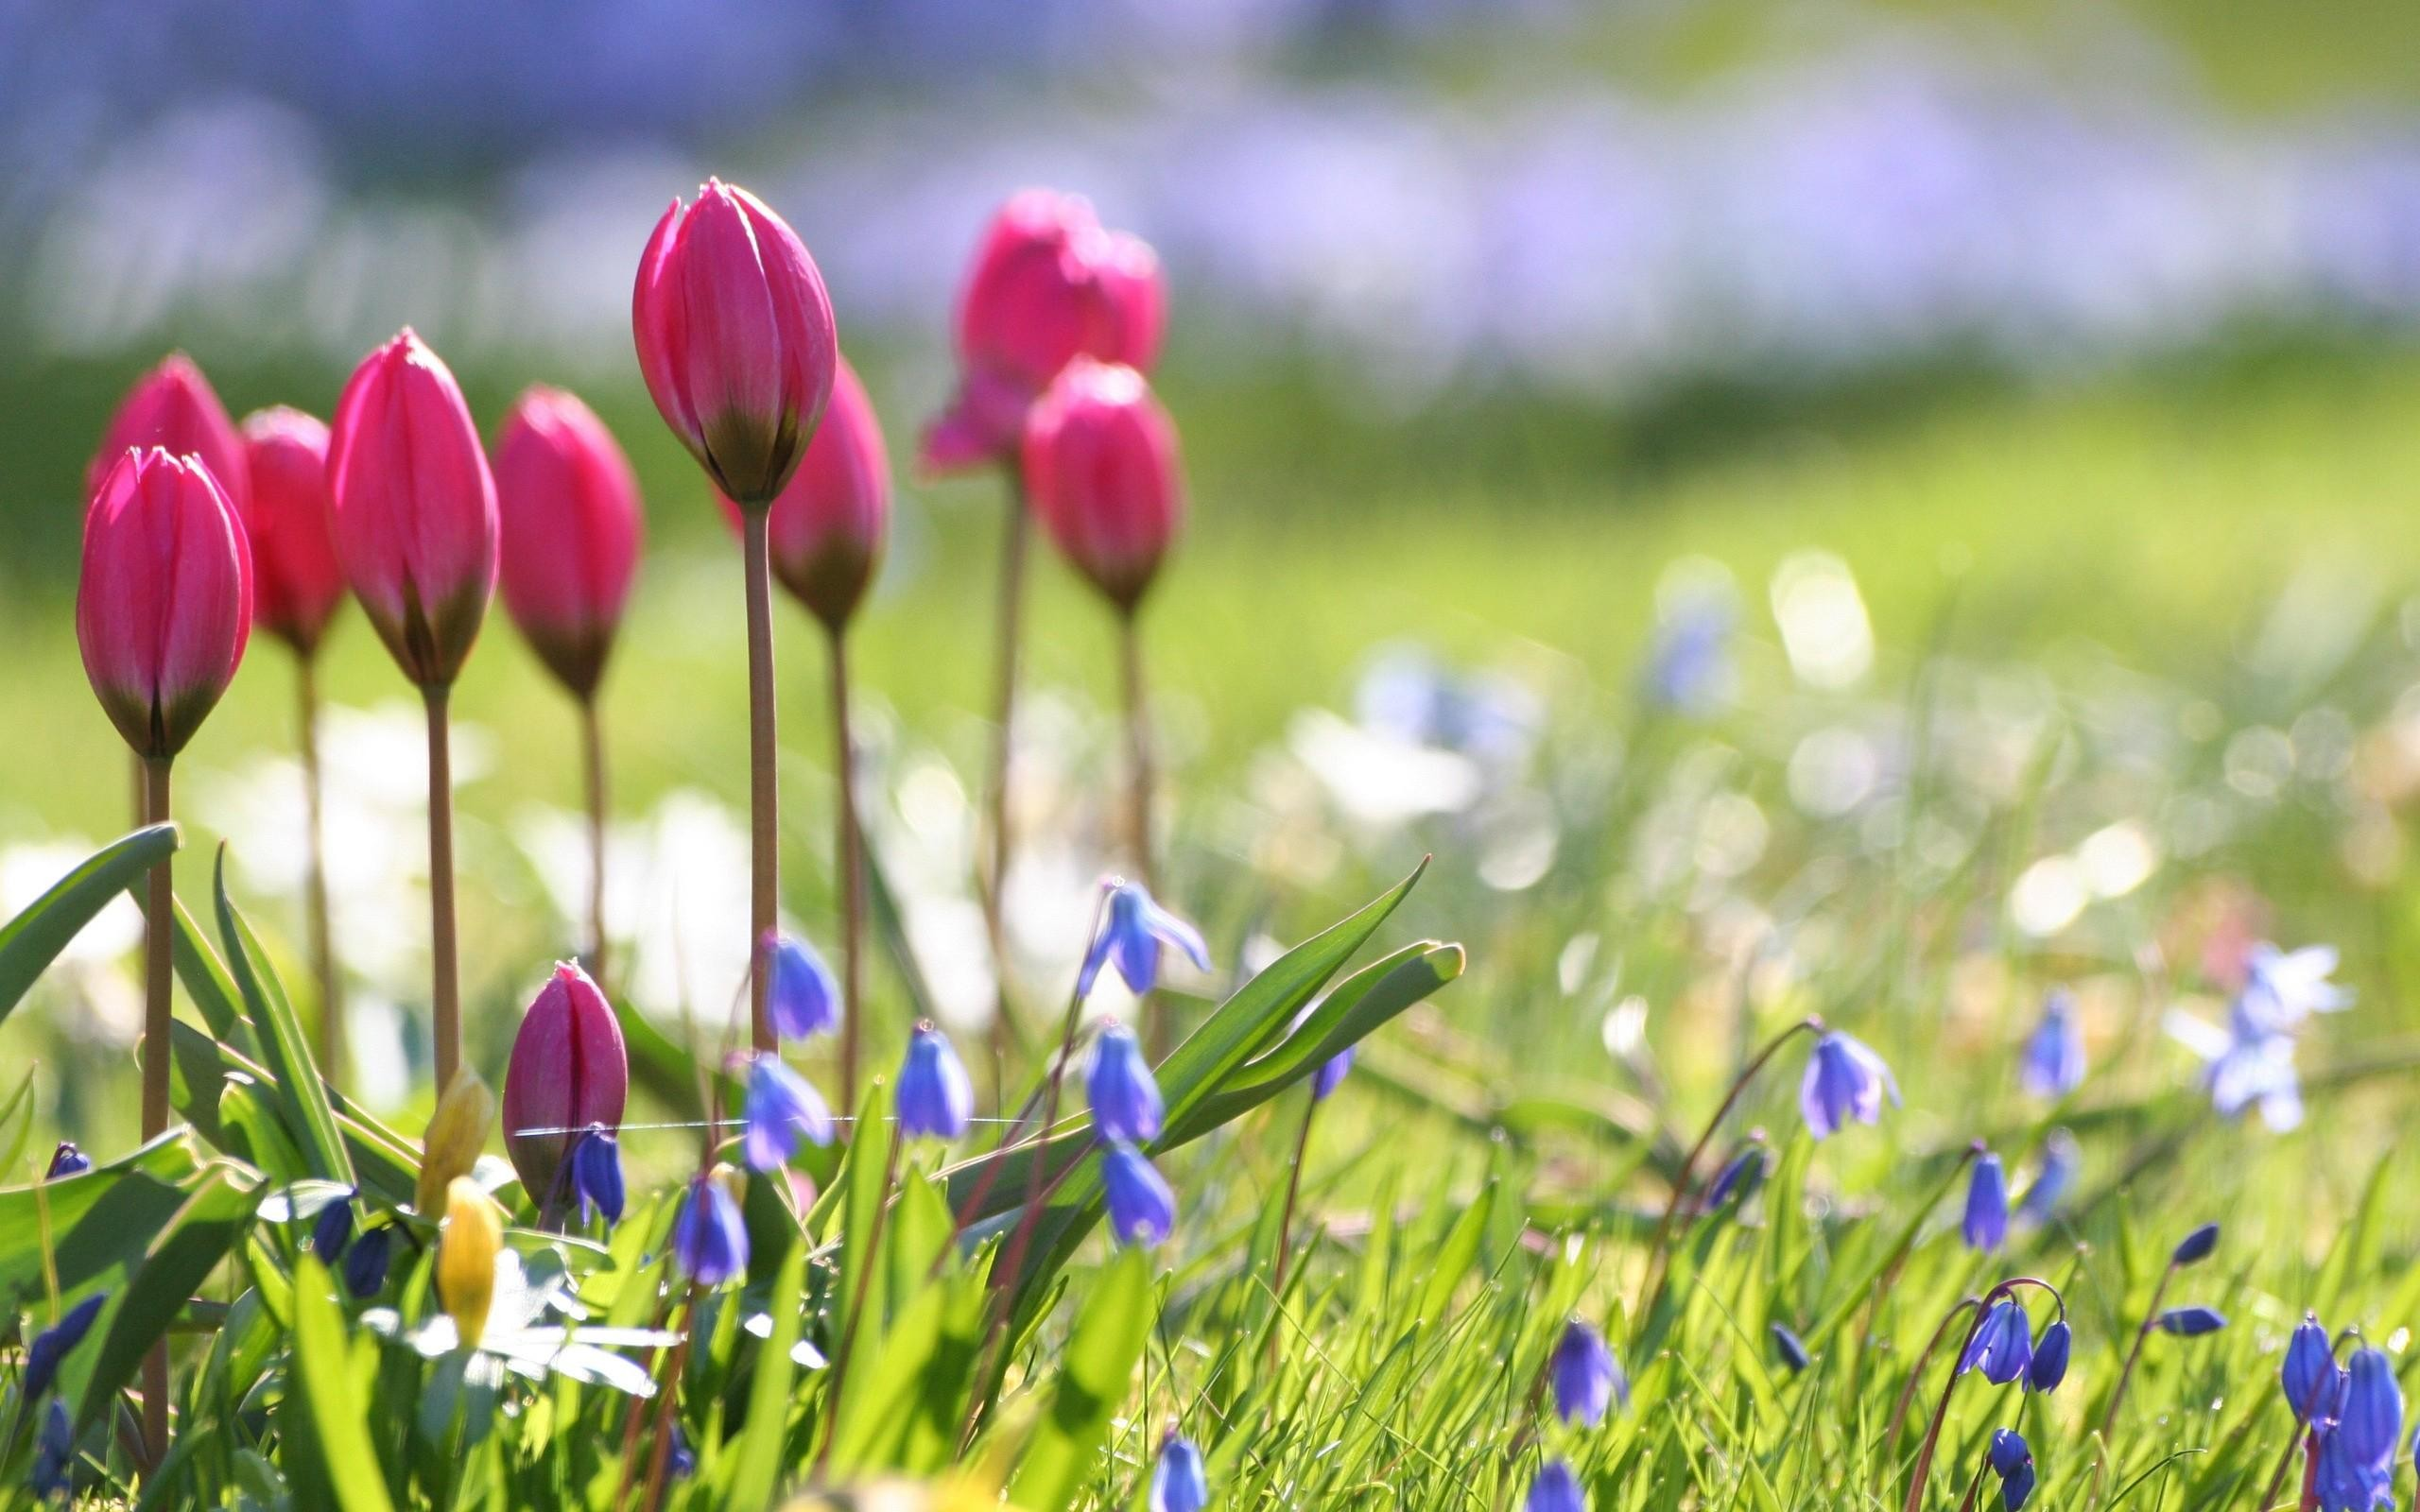 The 25+ best Spring flowers wallpaper ideas on Pinterest   Golden retriever  labrador, Puppy flowers and Cute puppy pics